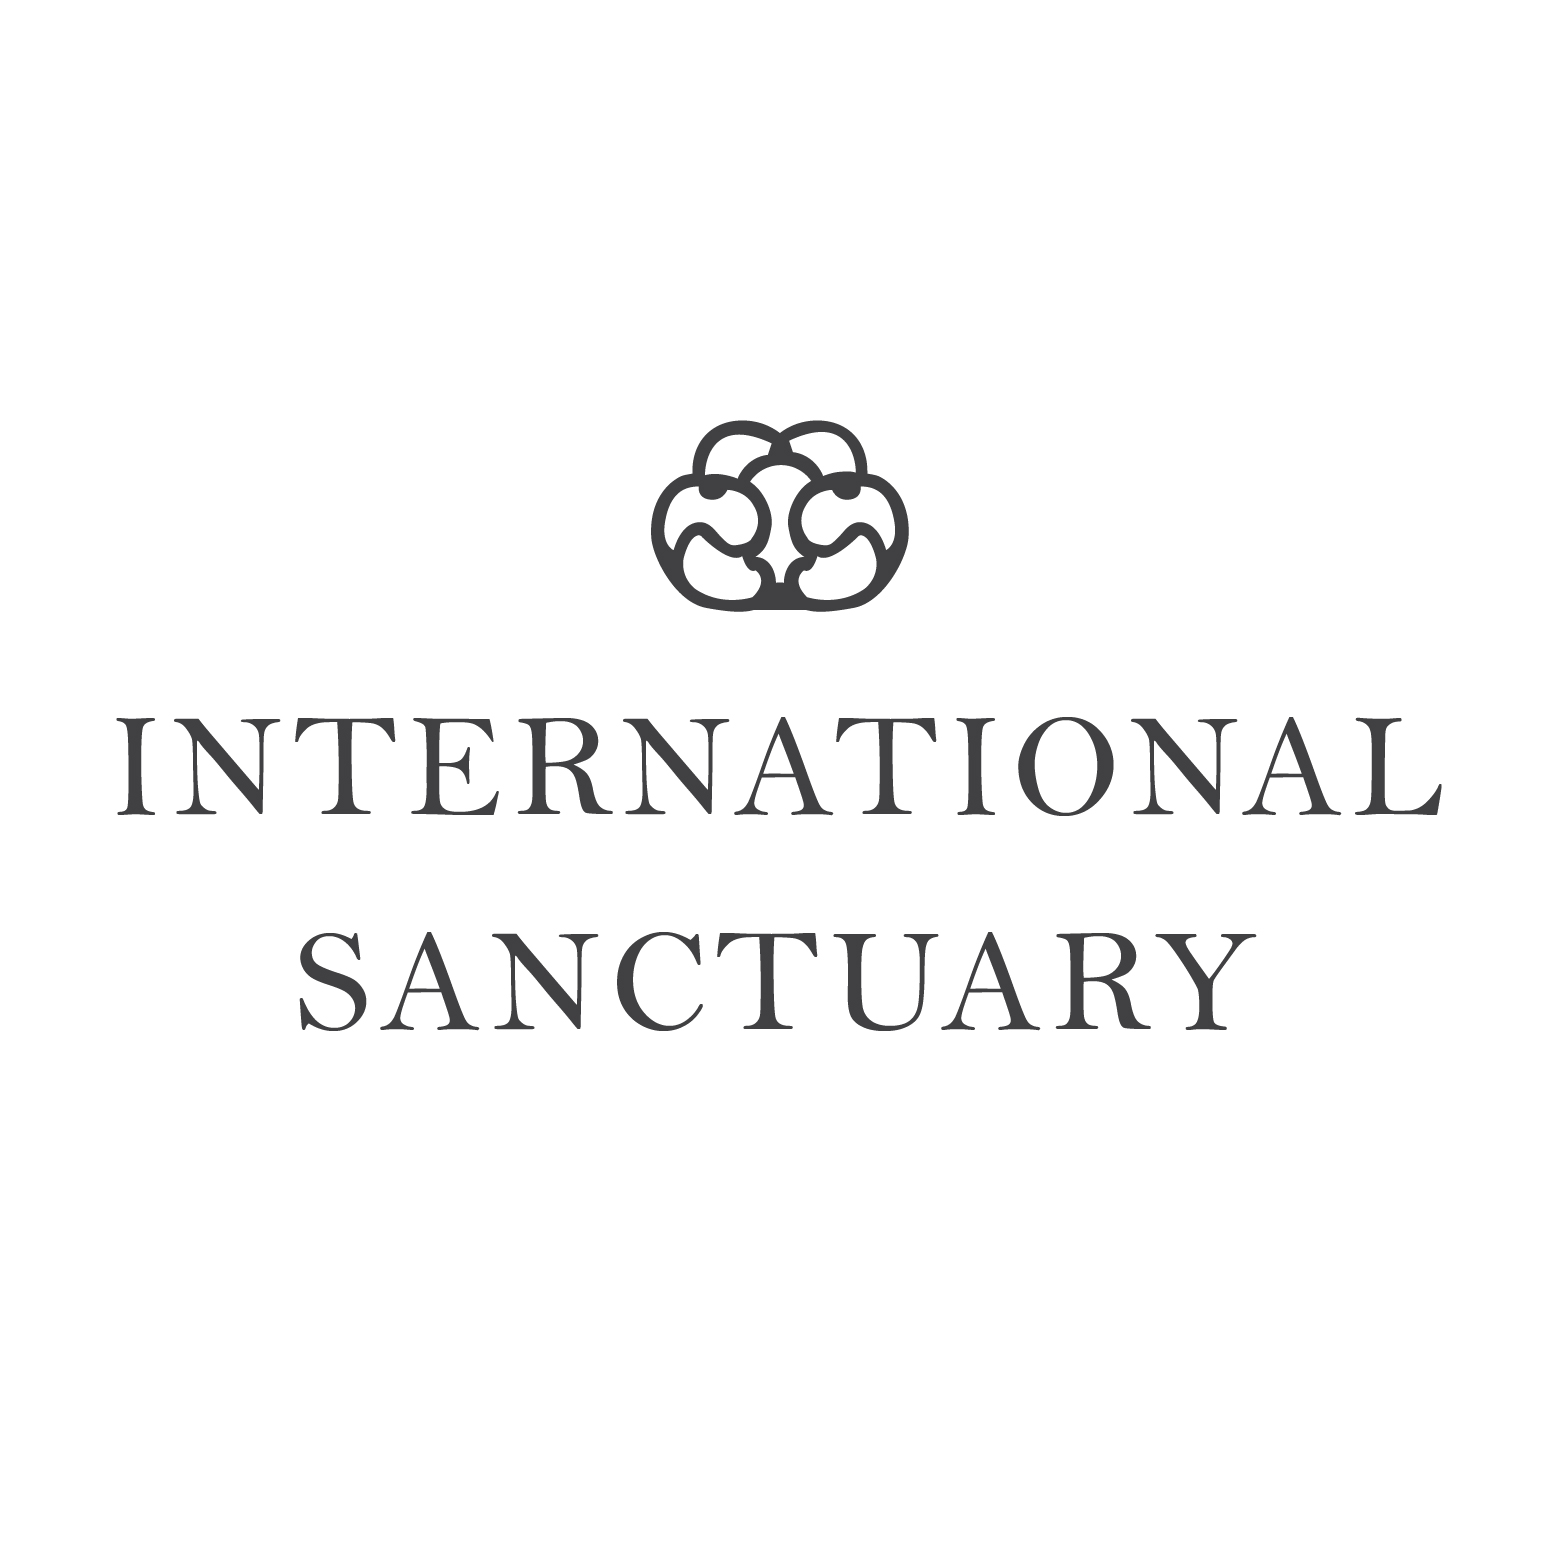 International Sanctuary